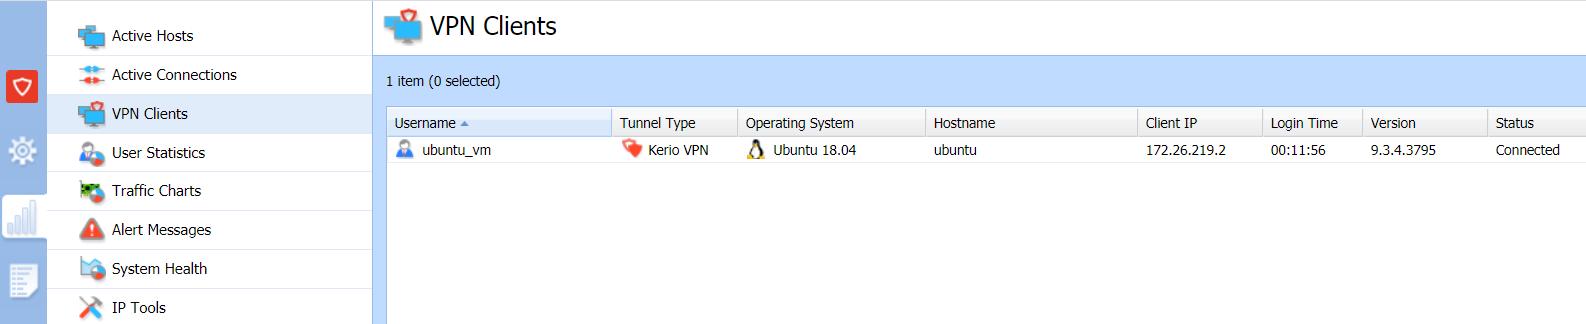 vpn_clients_connected.png